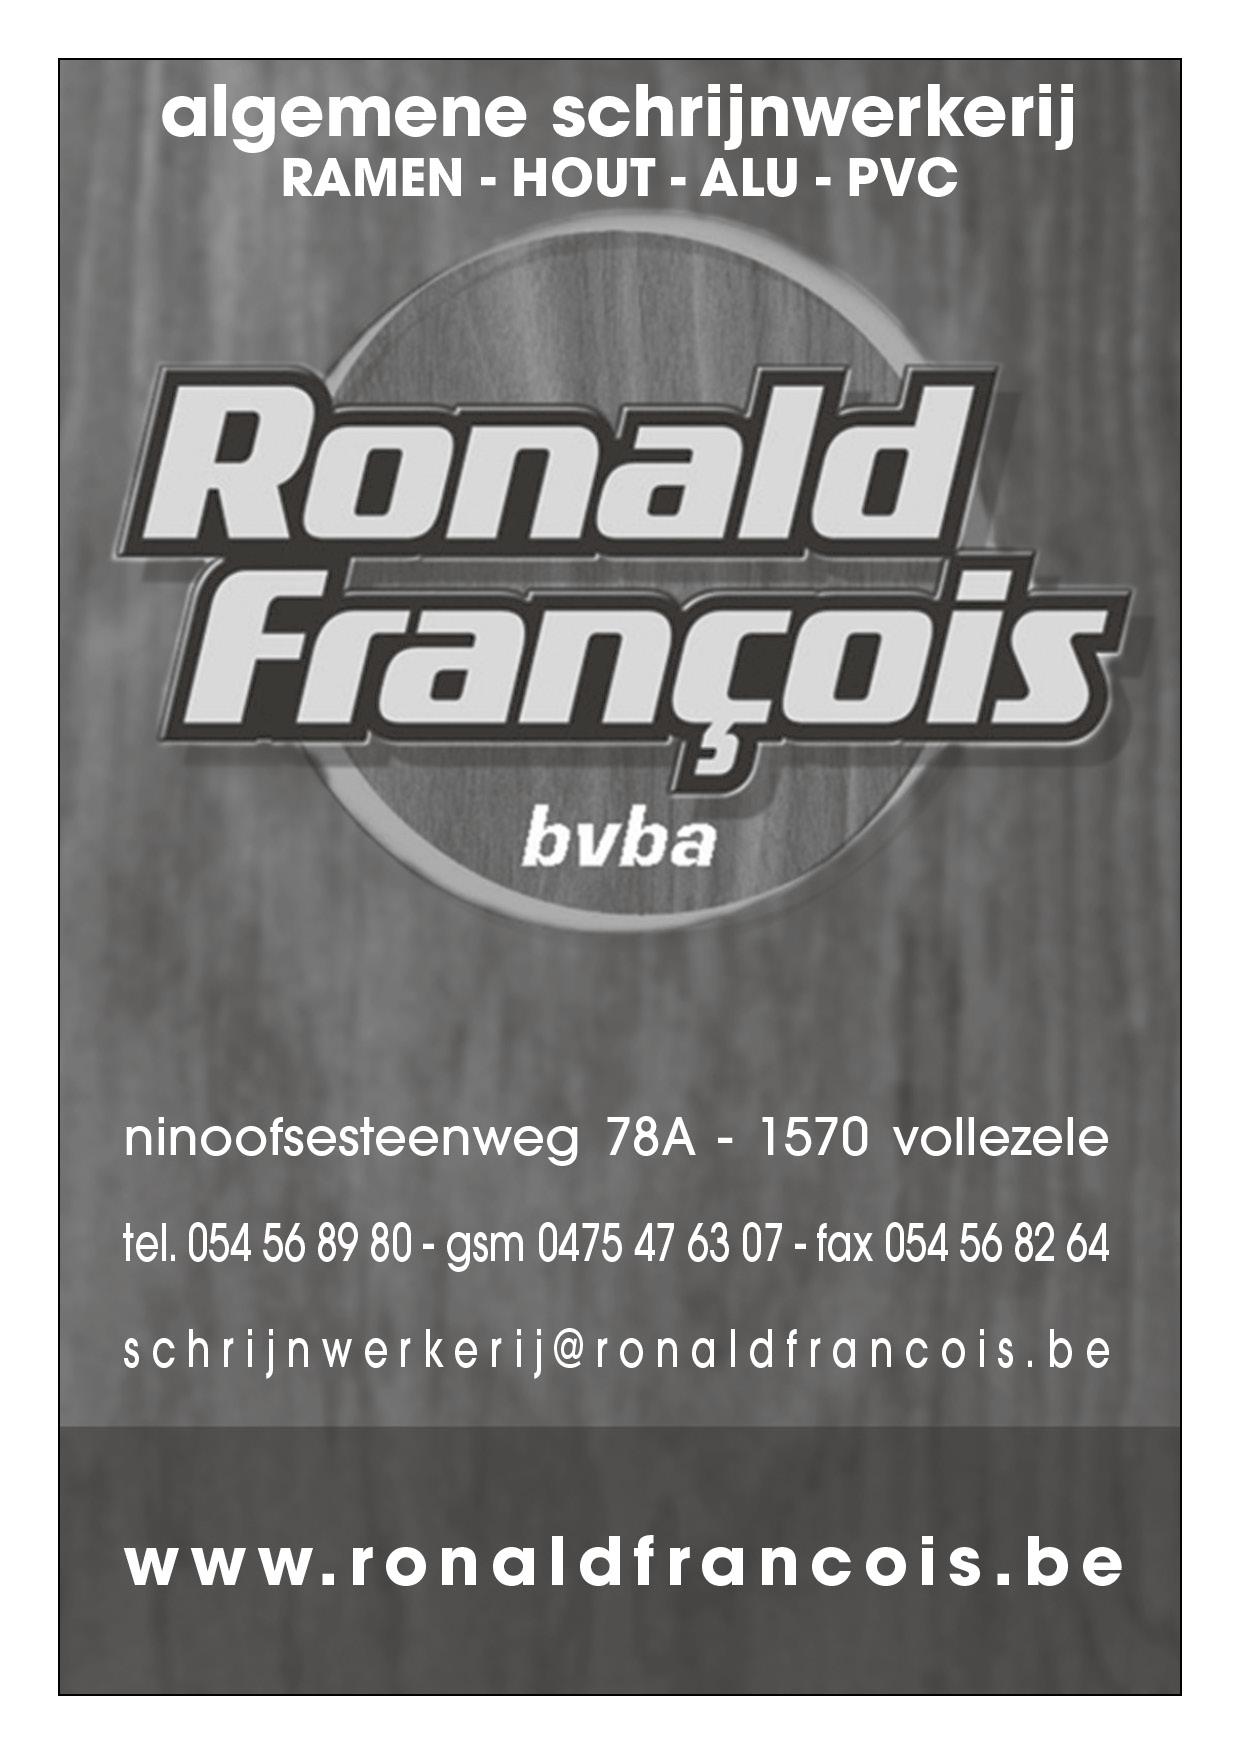 Ronald Francois